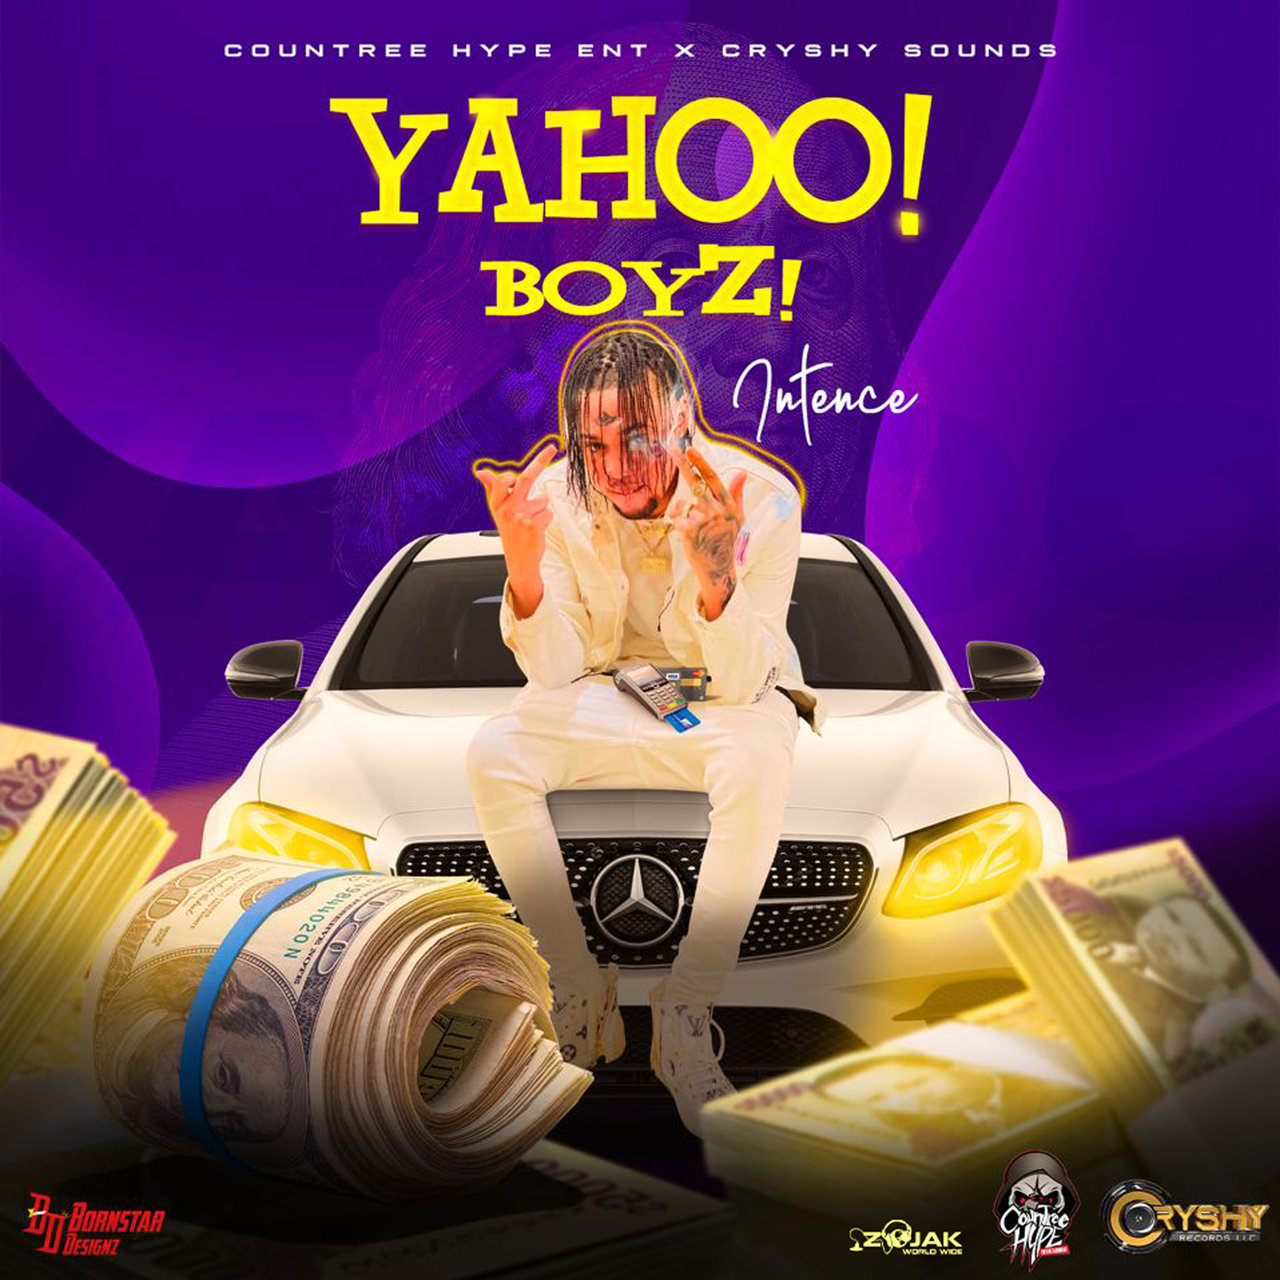 Intence - Yahoo Boyz (Cover)